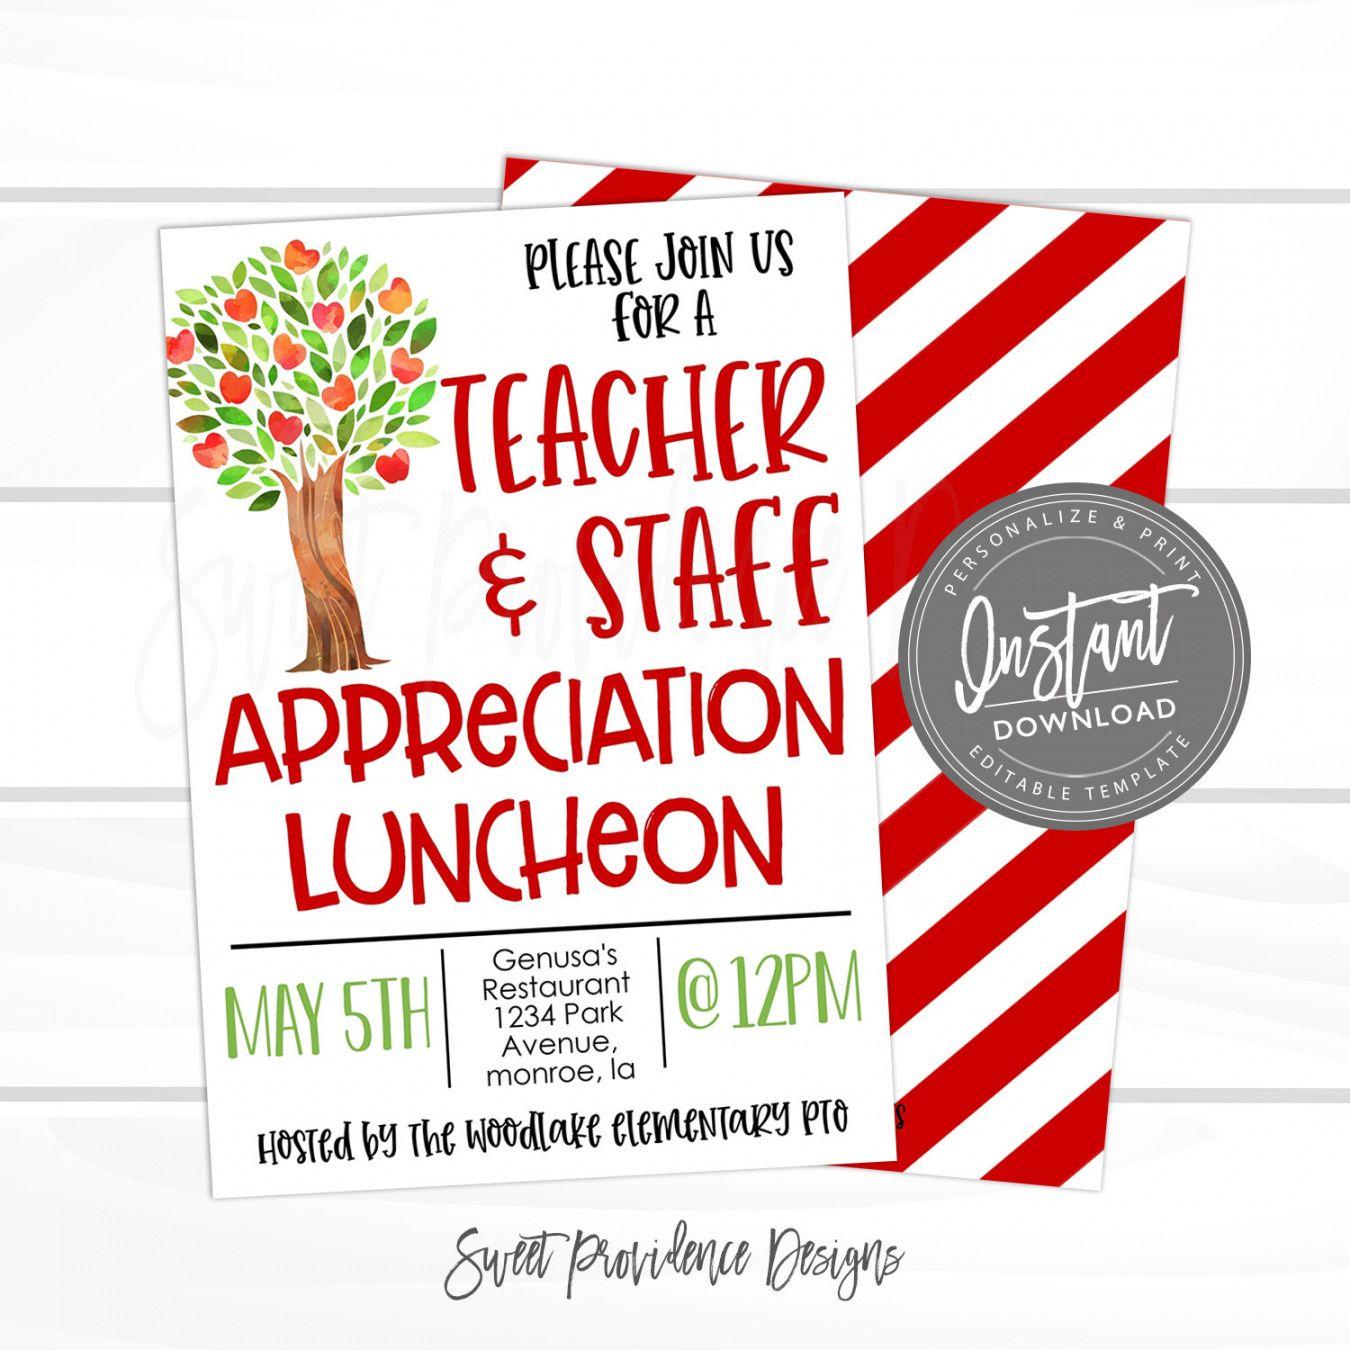 teacher appreciation luncheon invitation apple tree theme luncheon pto  pta fundraiser flyer editable template instant access edit now teacher appreciation flyer template and sample